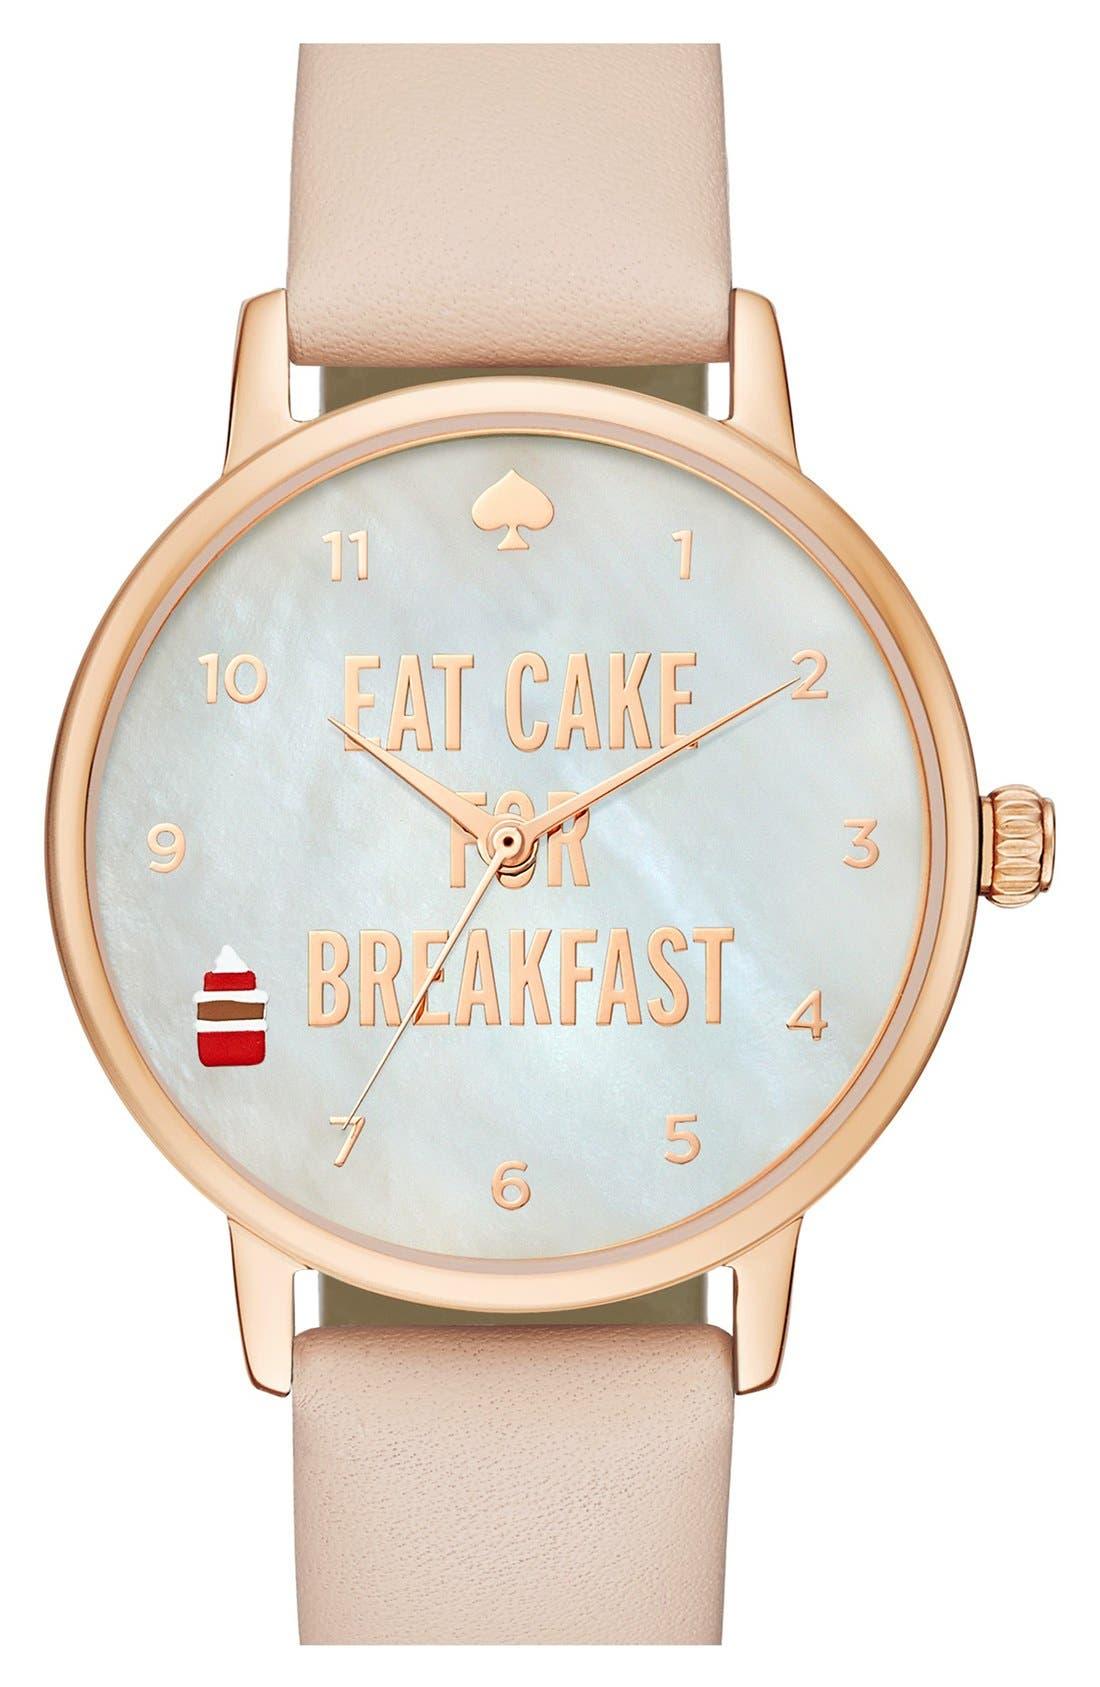 Main Image - kate spade new york 'metro - eat cake' leather strap watch, 34mm